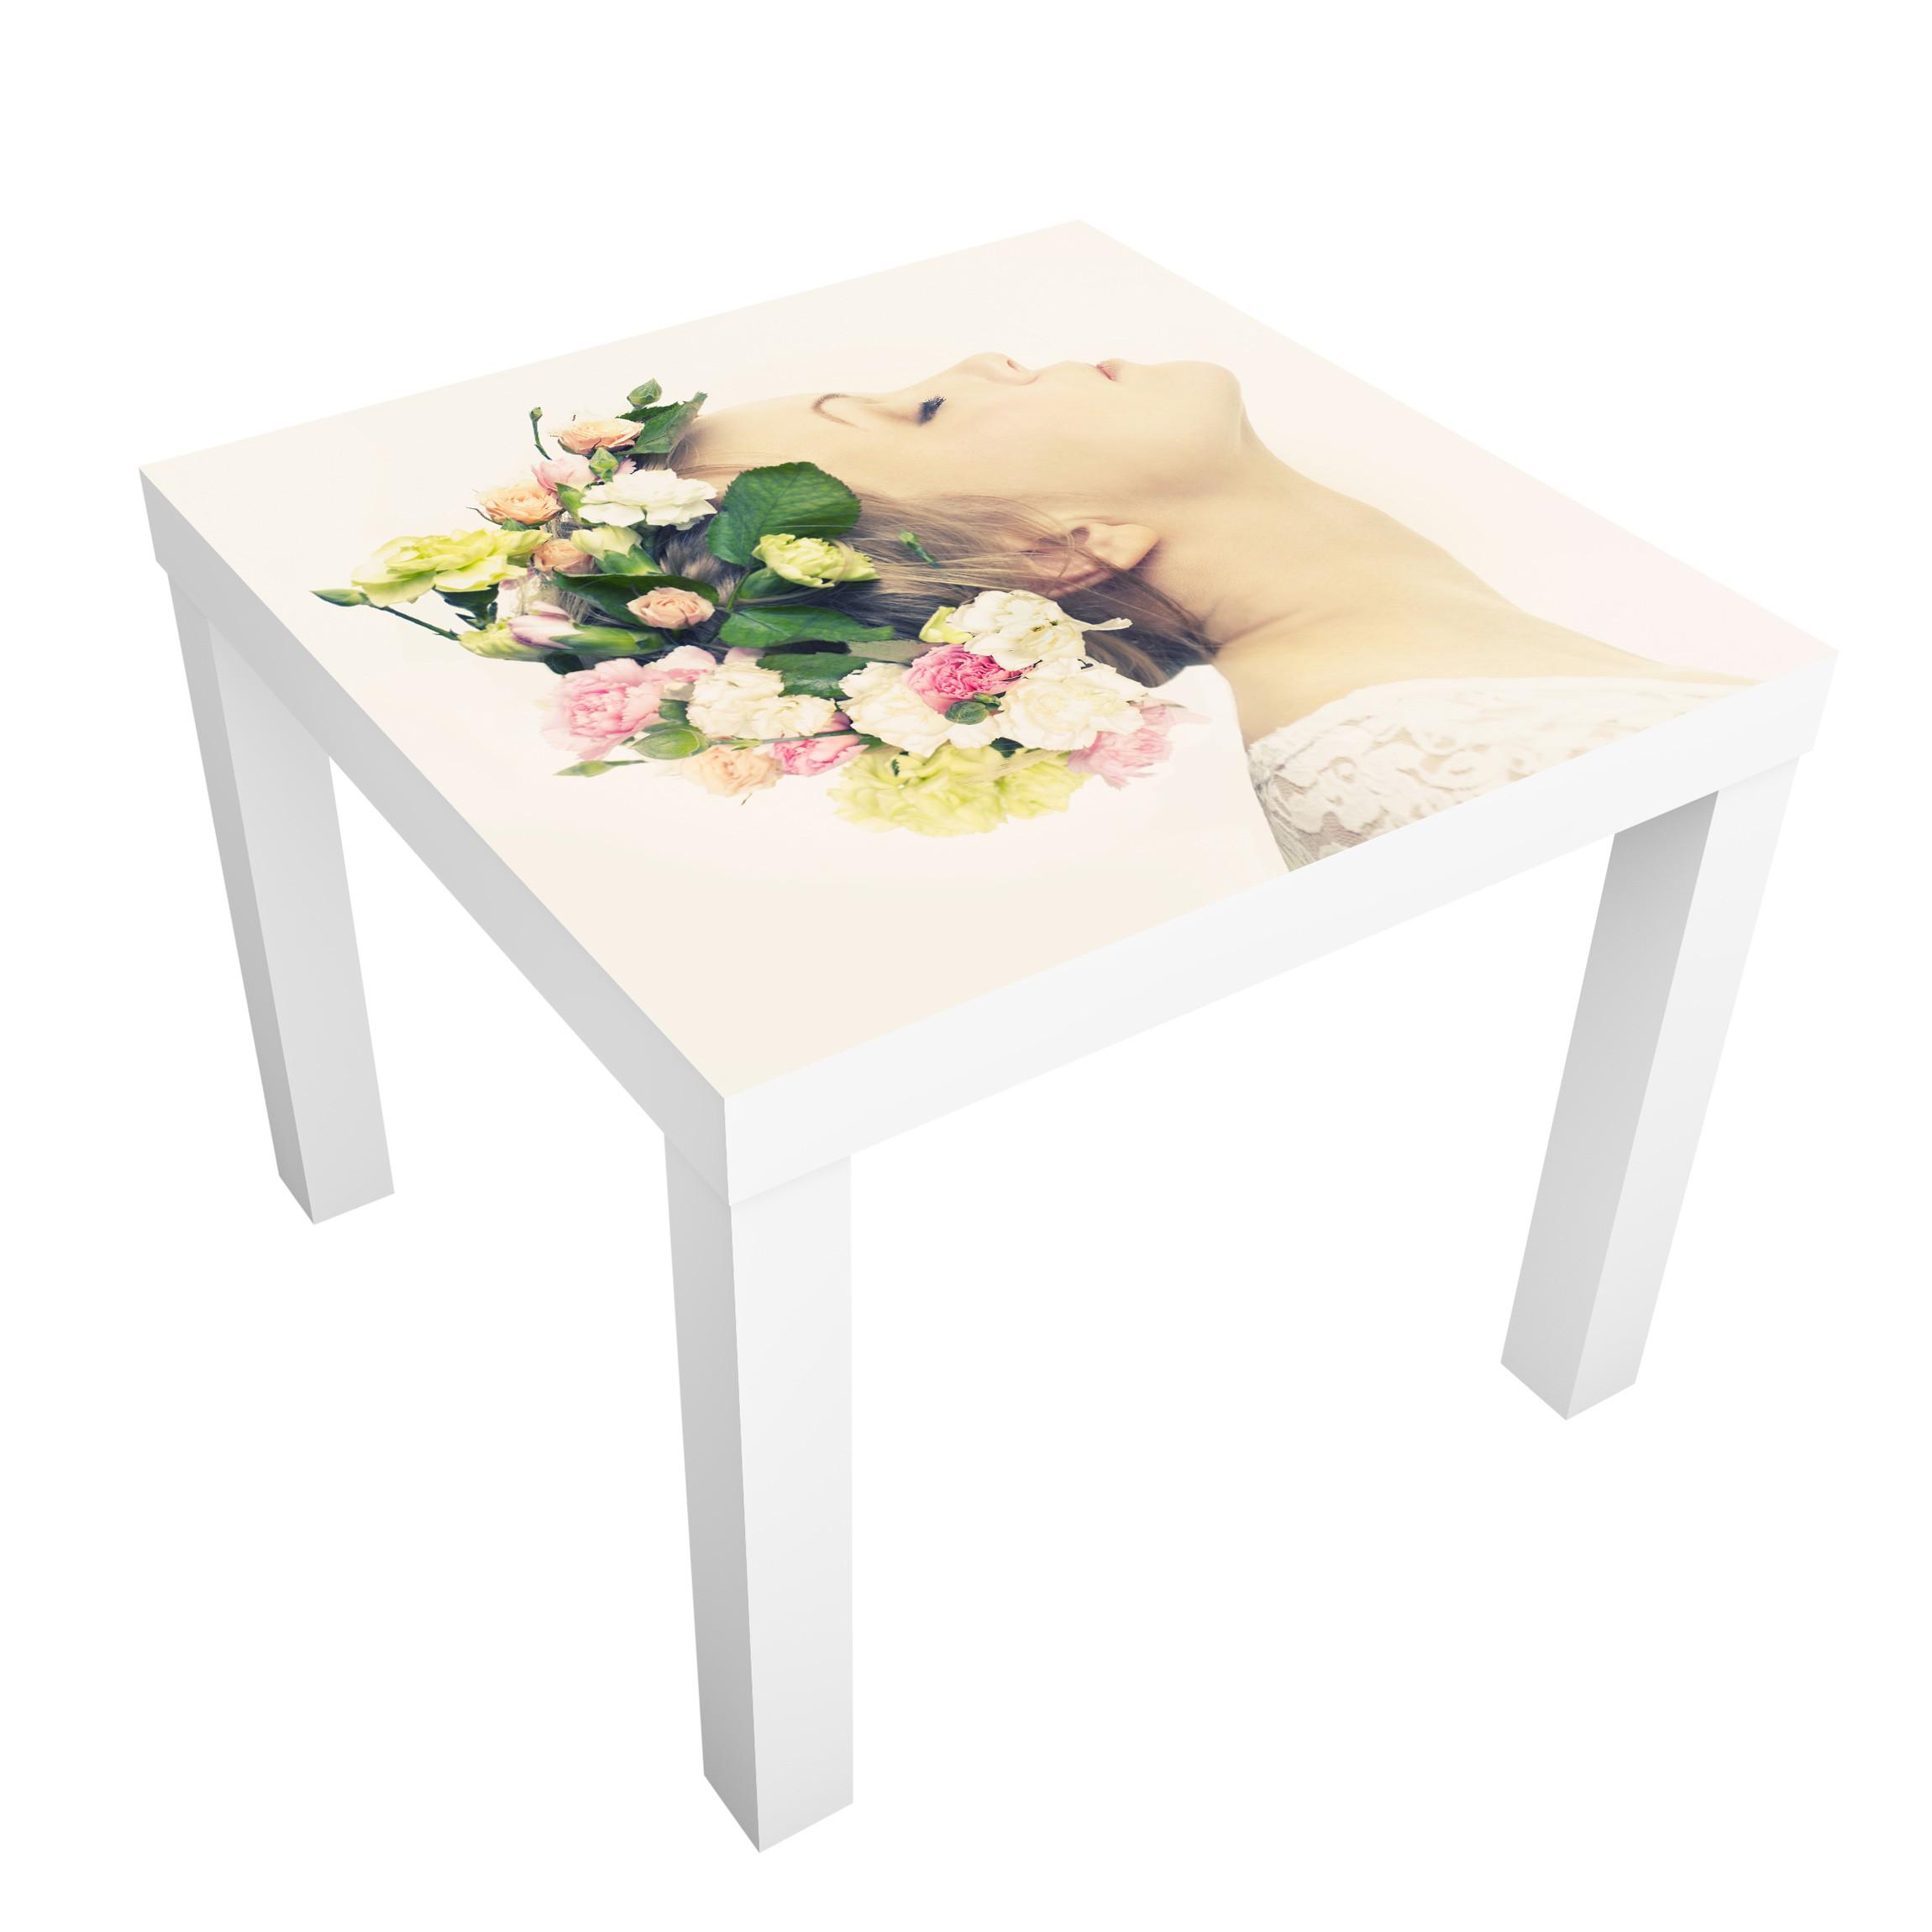 Carta adesiva per mobili ikea lack tavolino princess snow white - Ikea lack tavolino ...